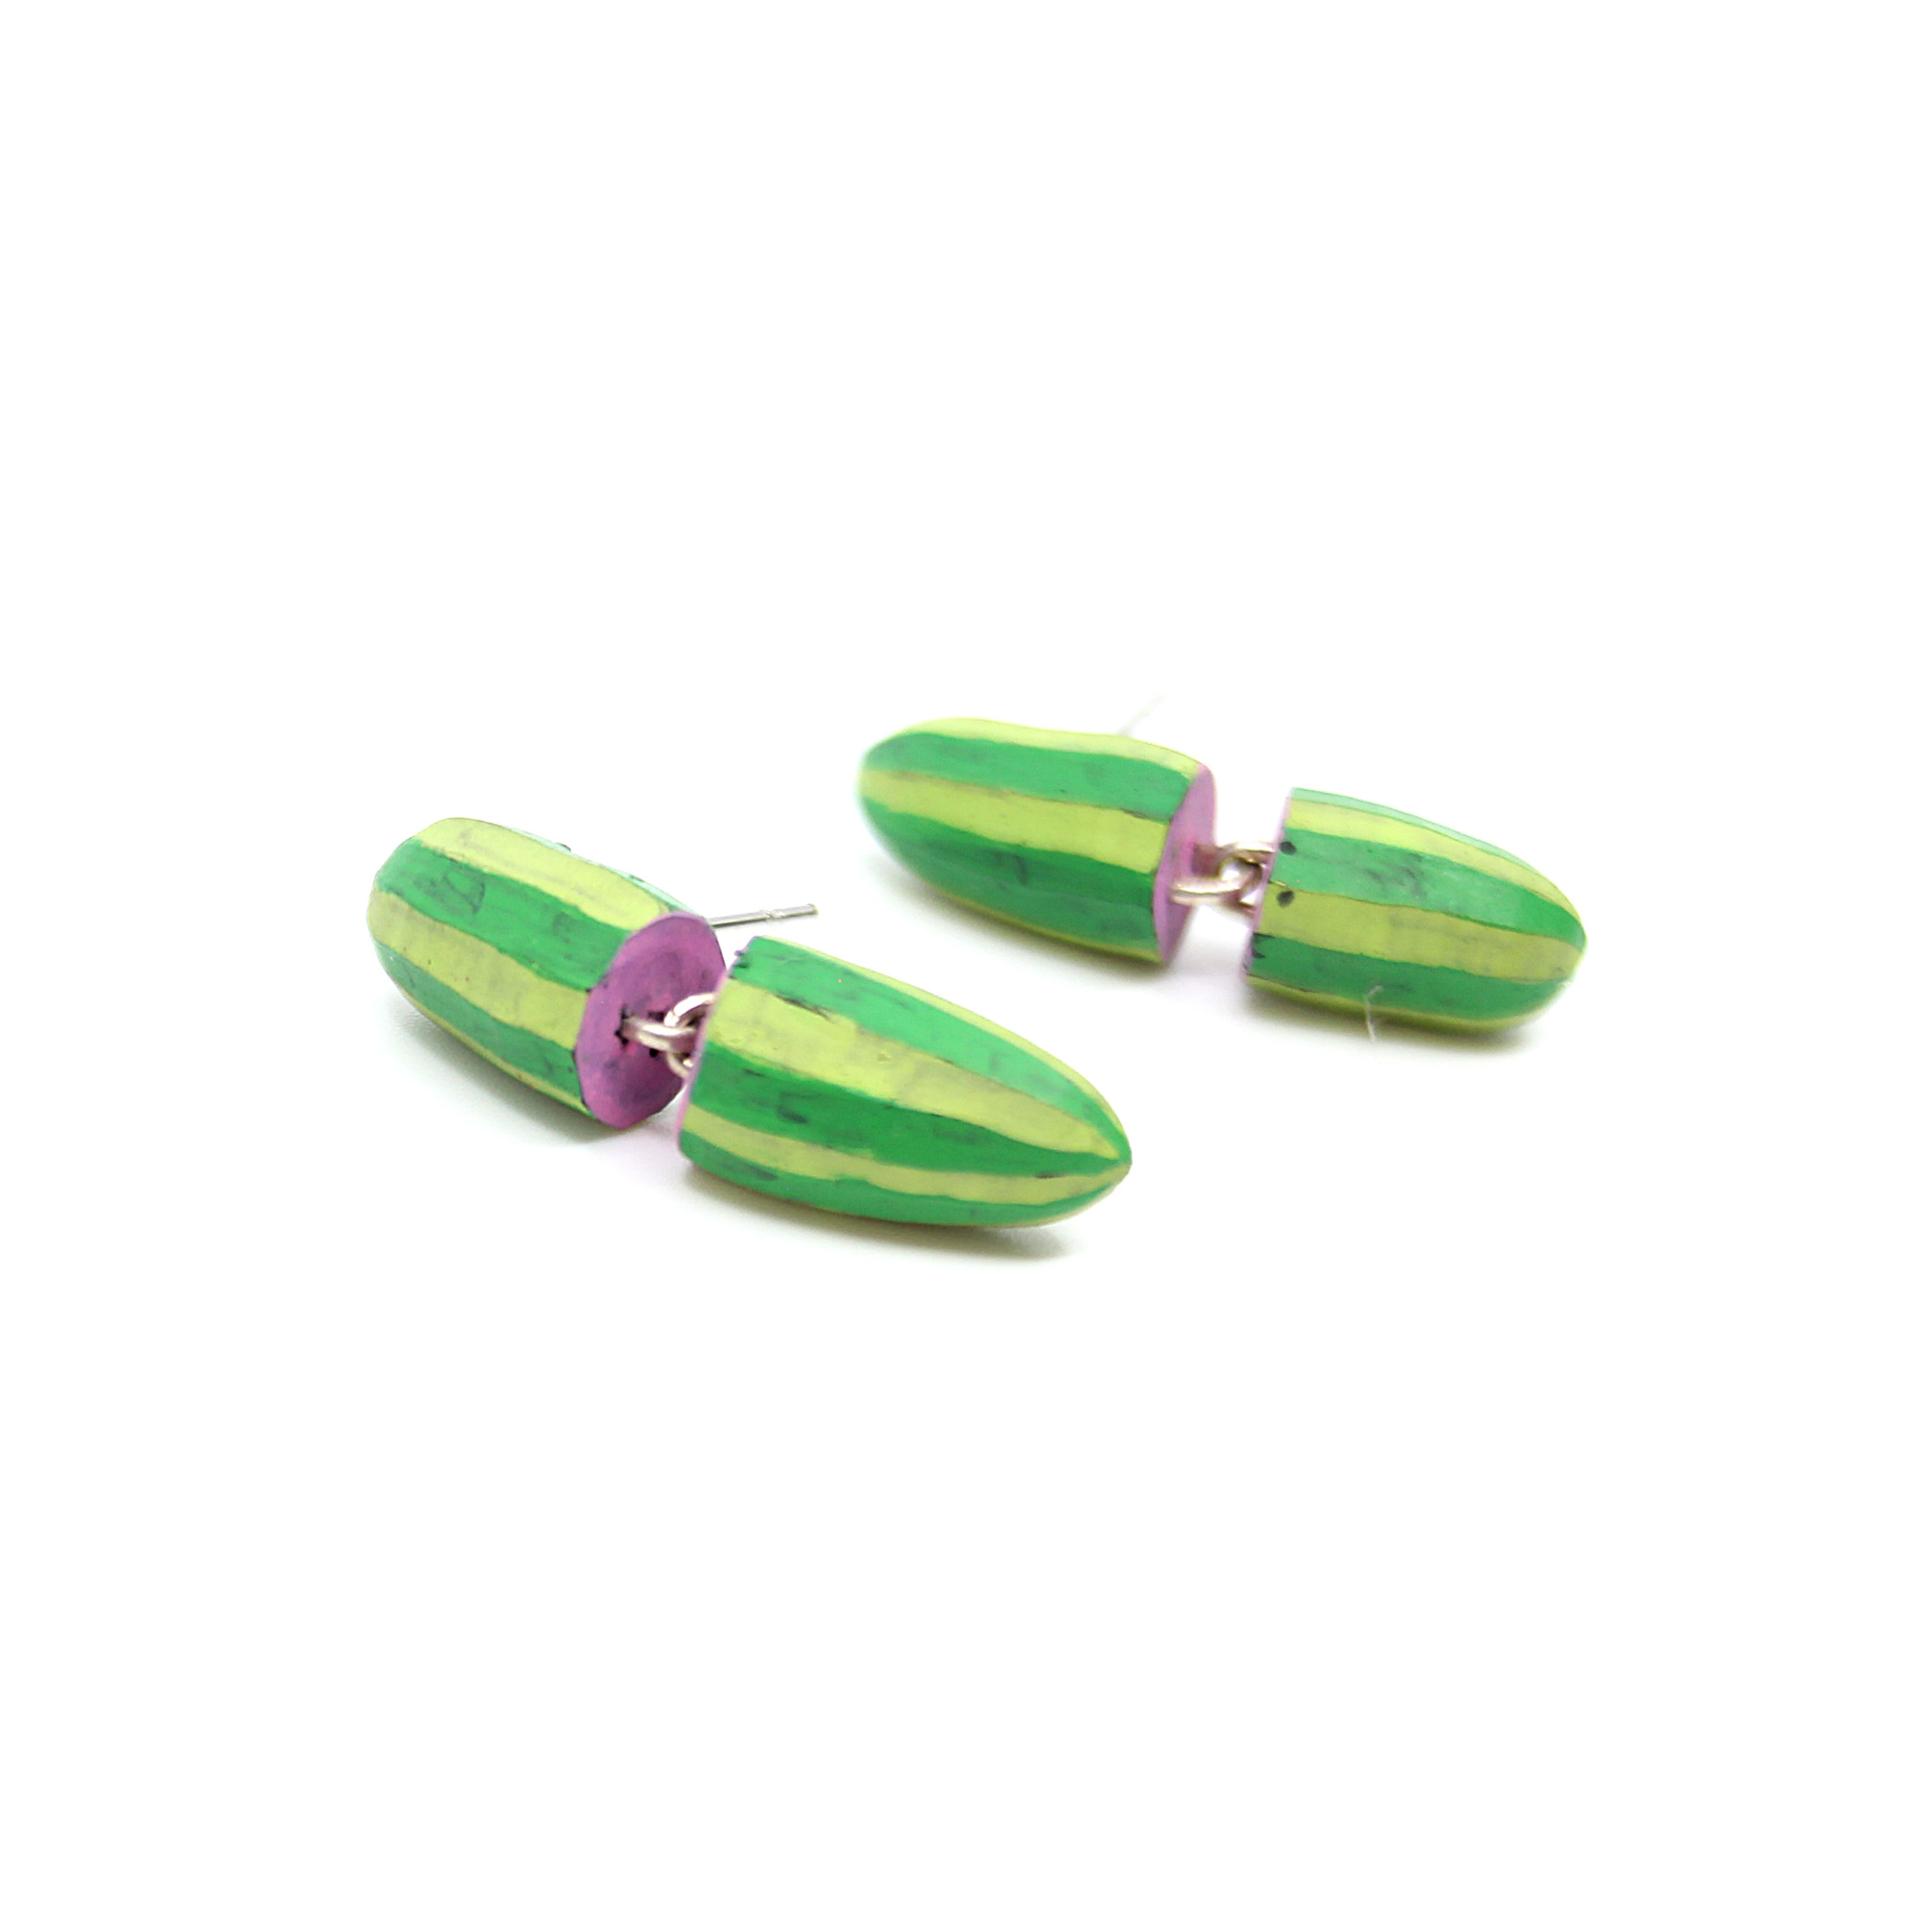 Mini Cacti Earrings by Lindsay Locatelli